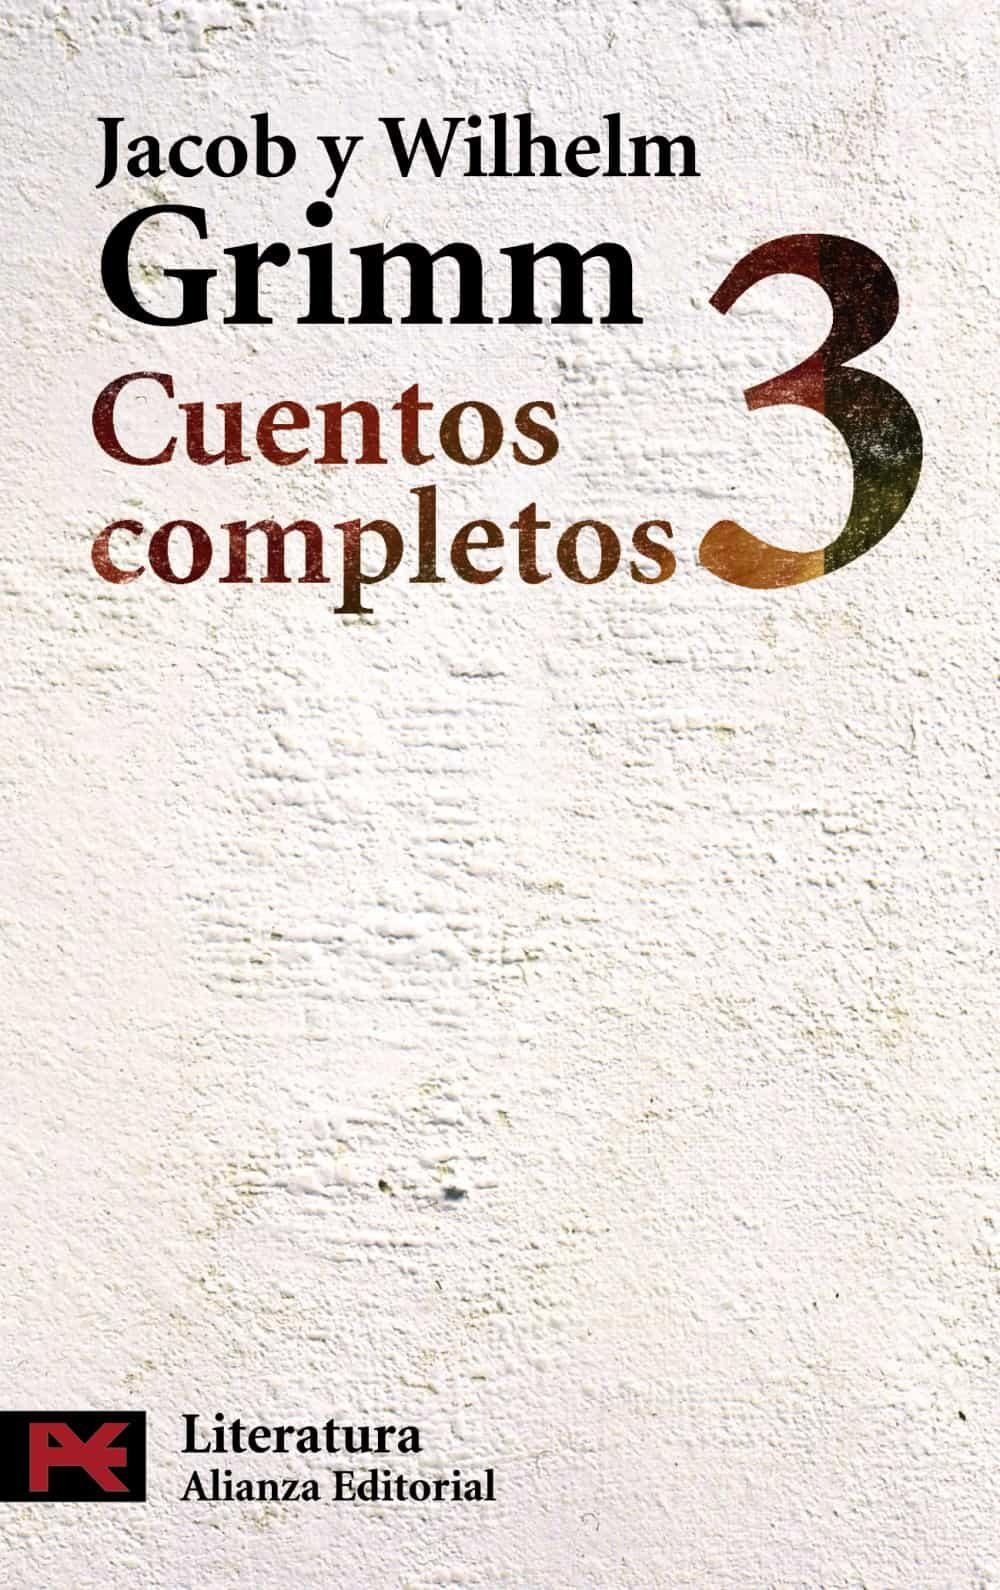 cuentos completos 3-jacob grimm-wilhelm grimm-9788420649580